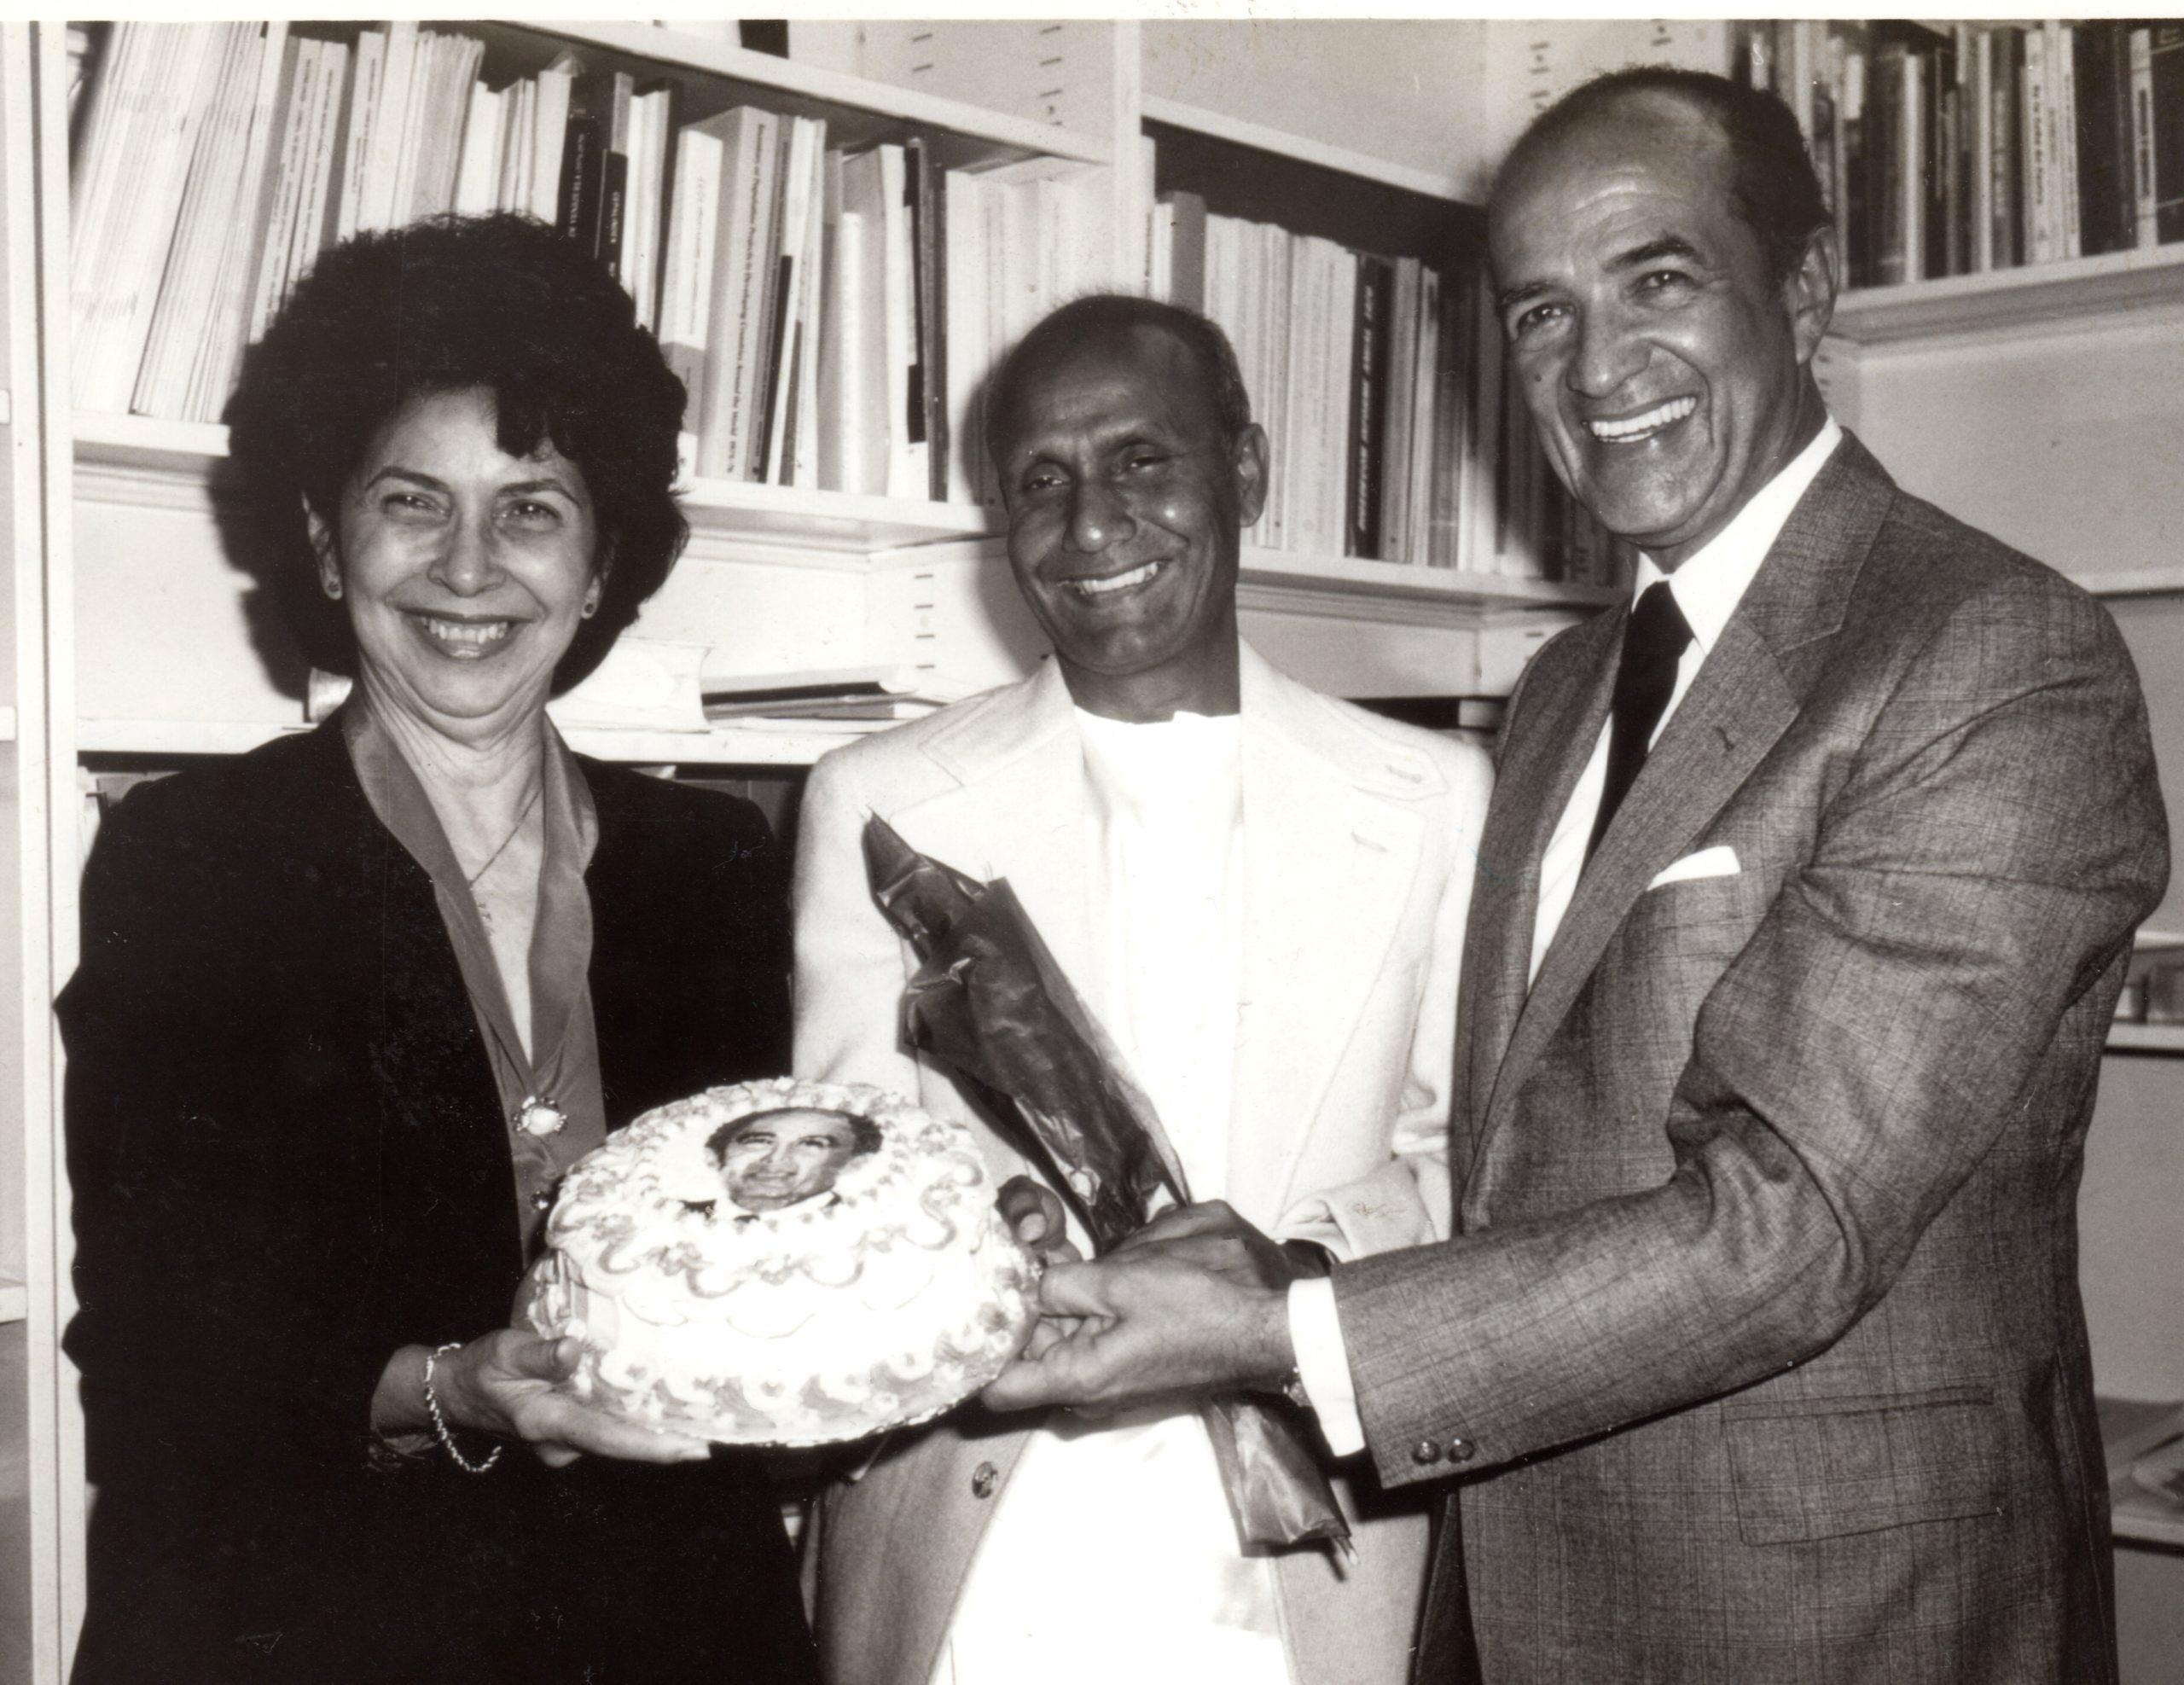 https://www.srichinmoypeacemeditationatun.org/wp-content/uploads/1981/09/1981-09sep-17-Foreign-Minister-Illueca-Panama-BD-cake-with-Mrs-crp-scaled.jpg